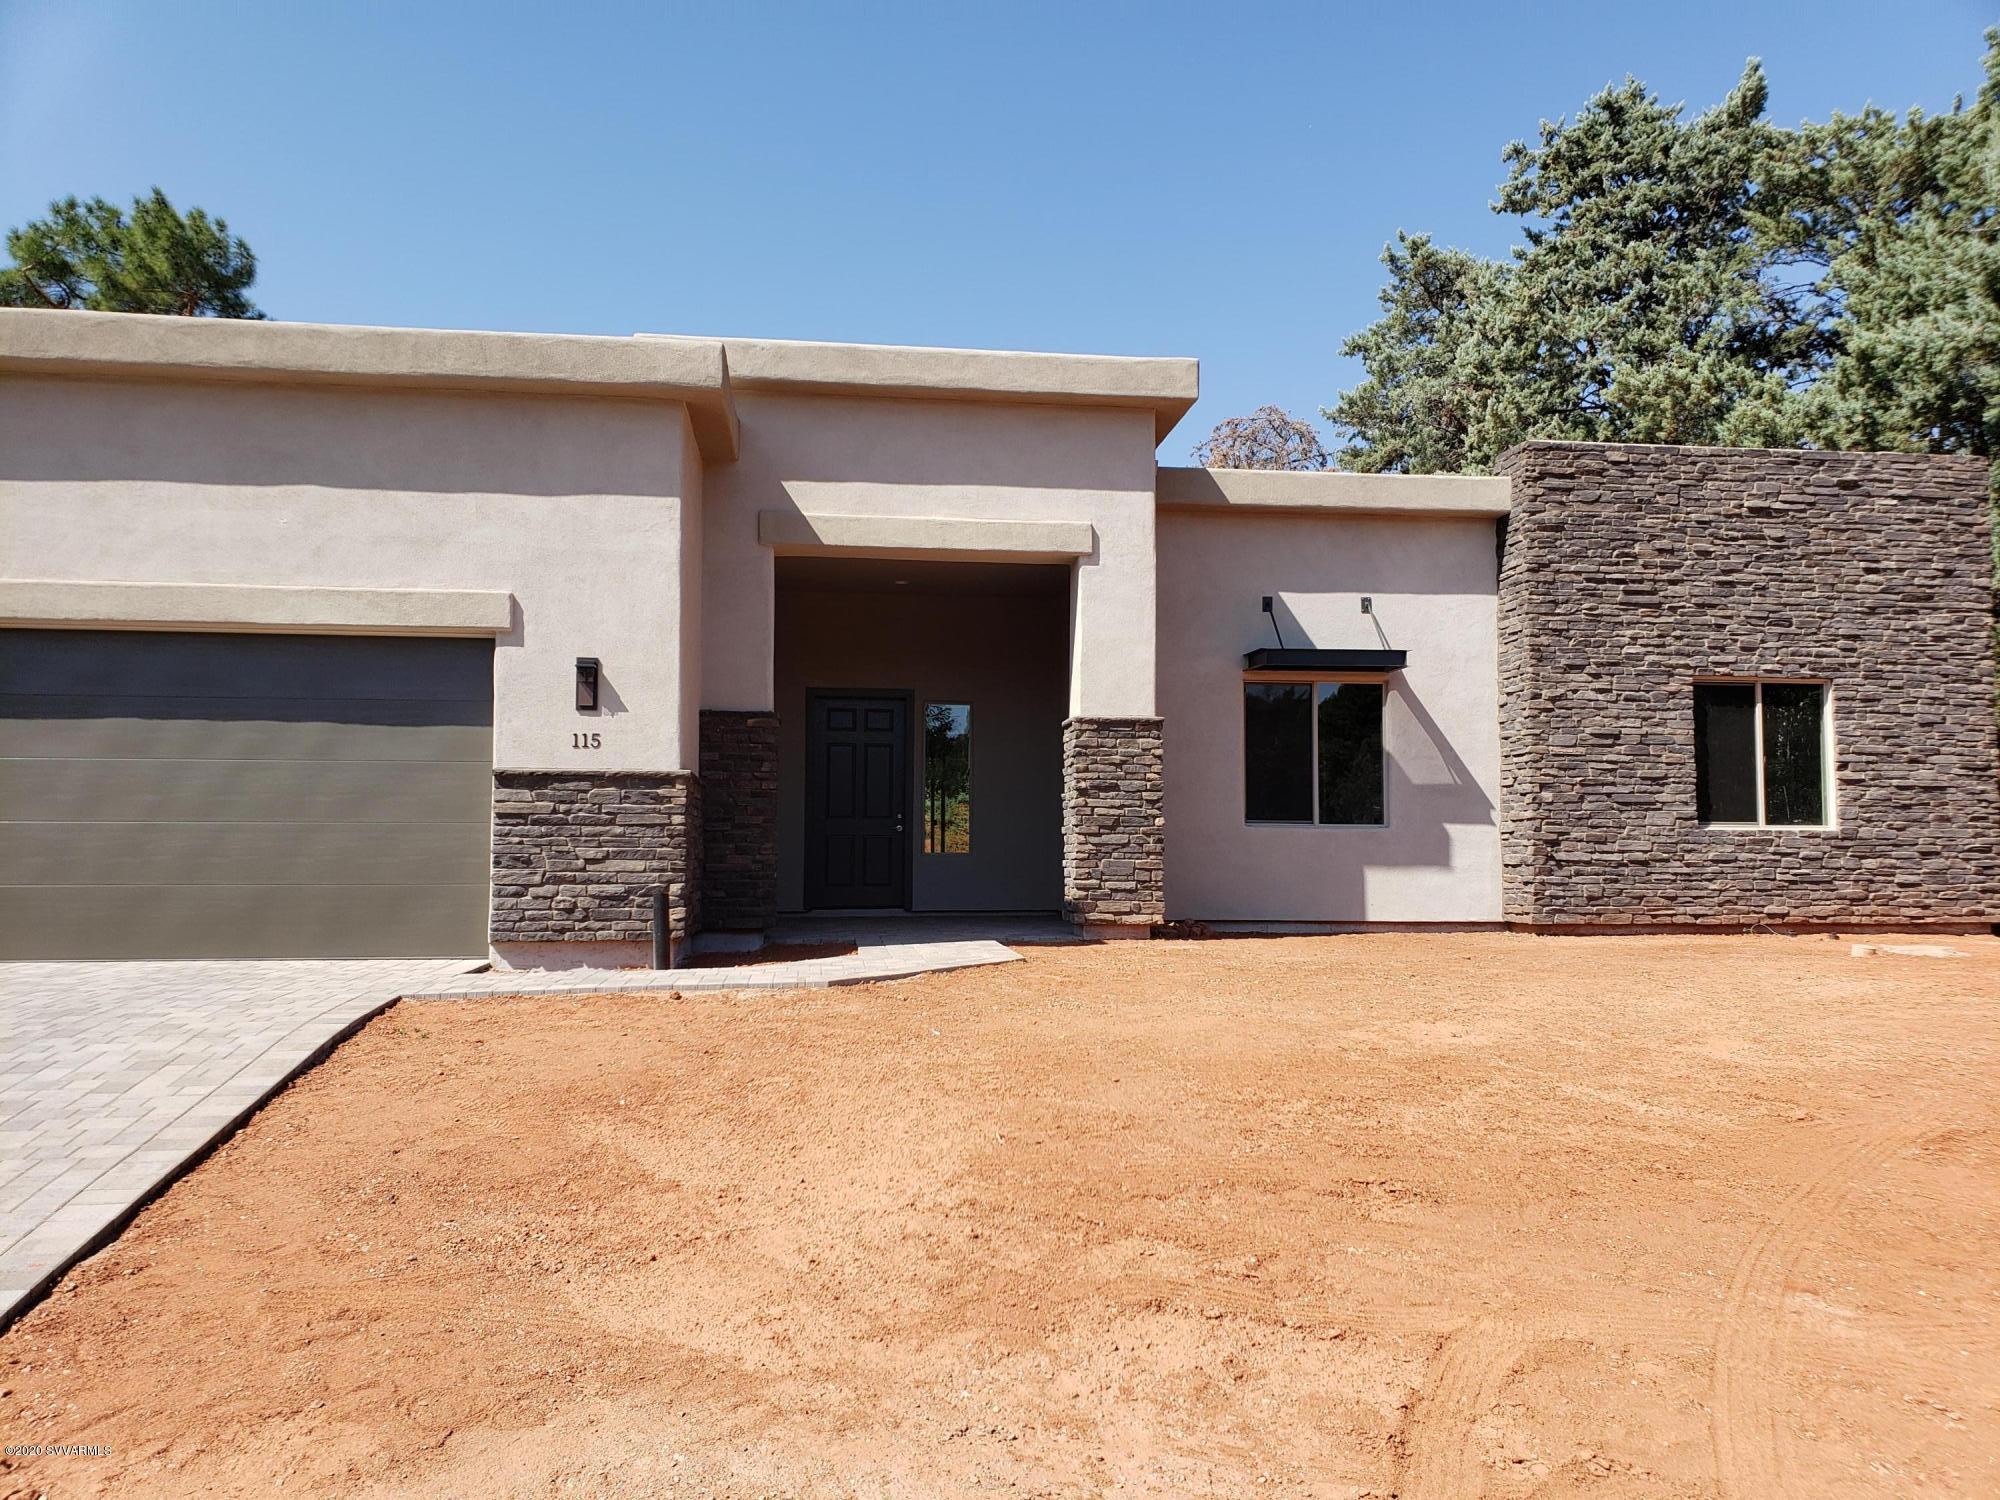 115 Arrowhead Drive Sedona, AZ 86351